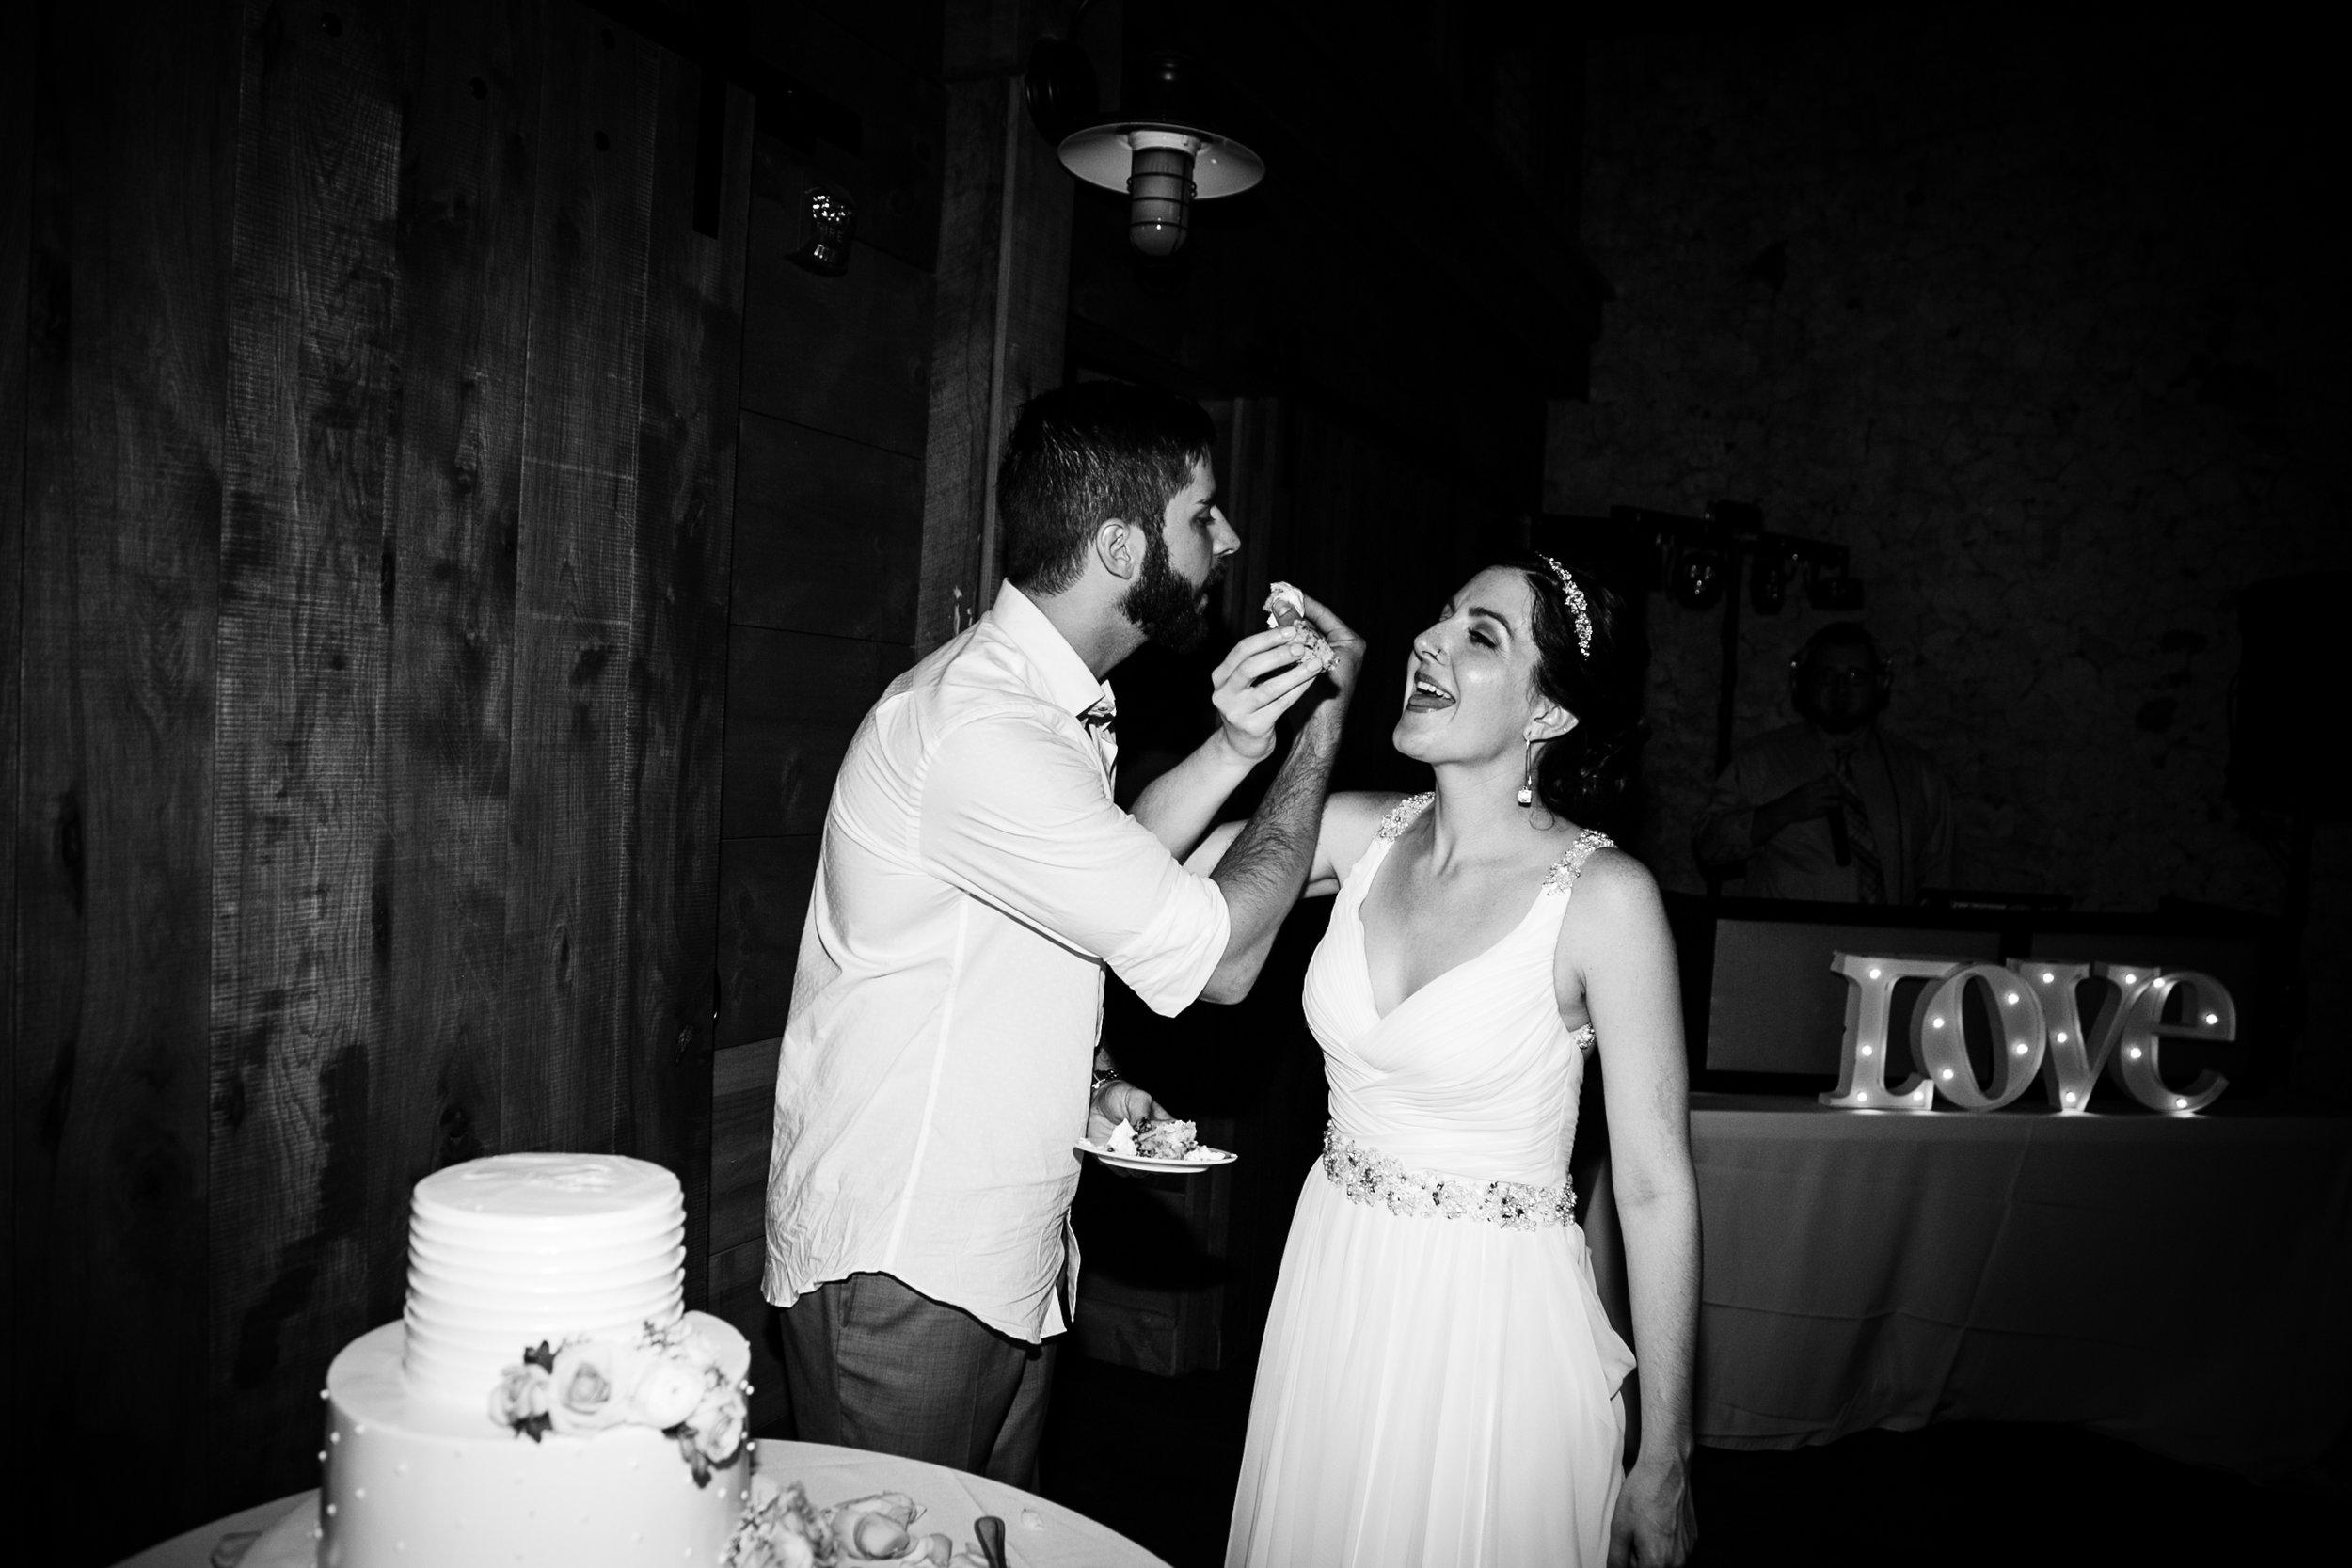 TYLER ARBORETUM WEDDING PHOTOGRAPHY LOVESTRUCK PICTURES-100.jpg